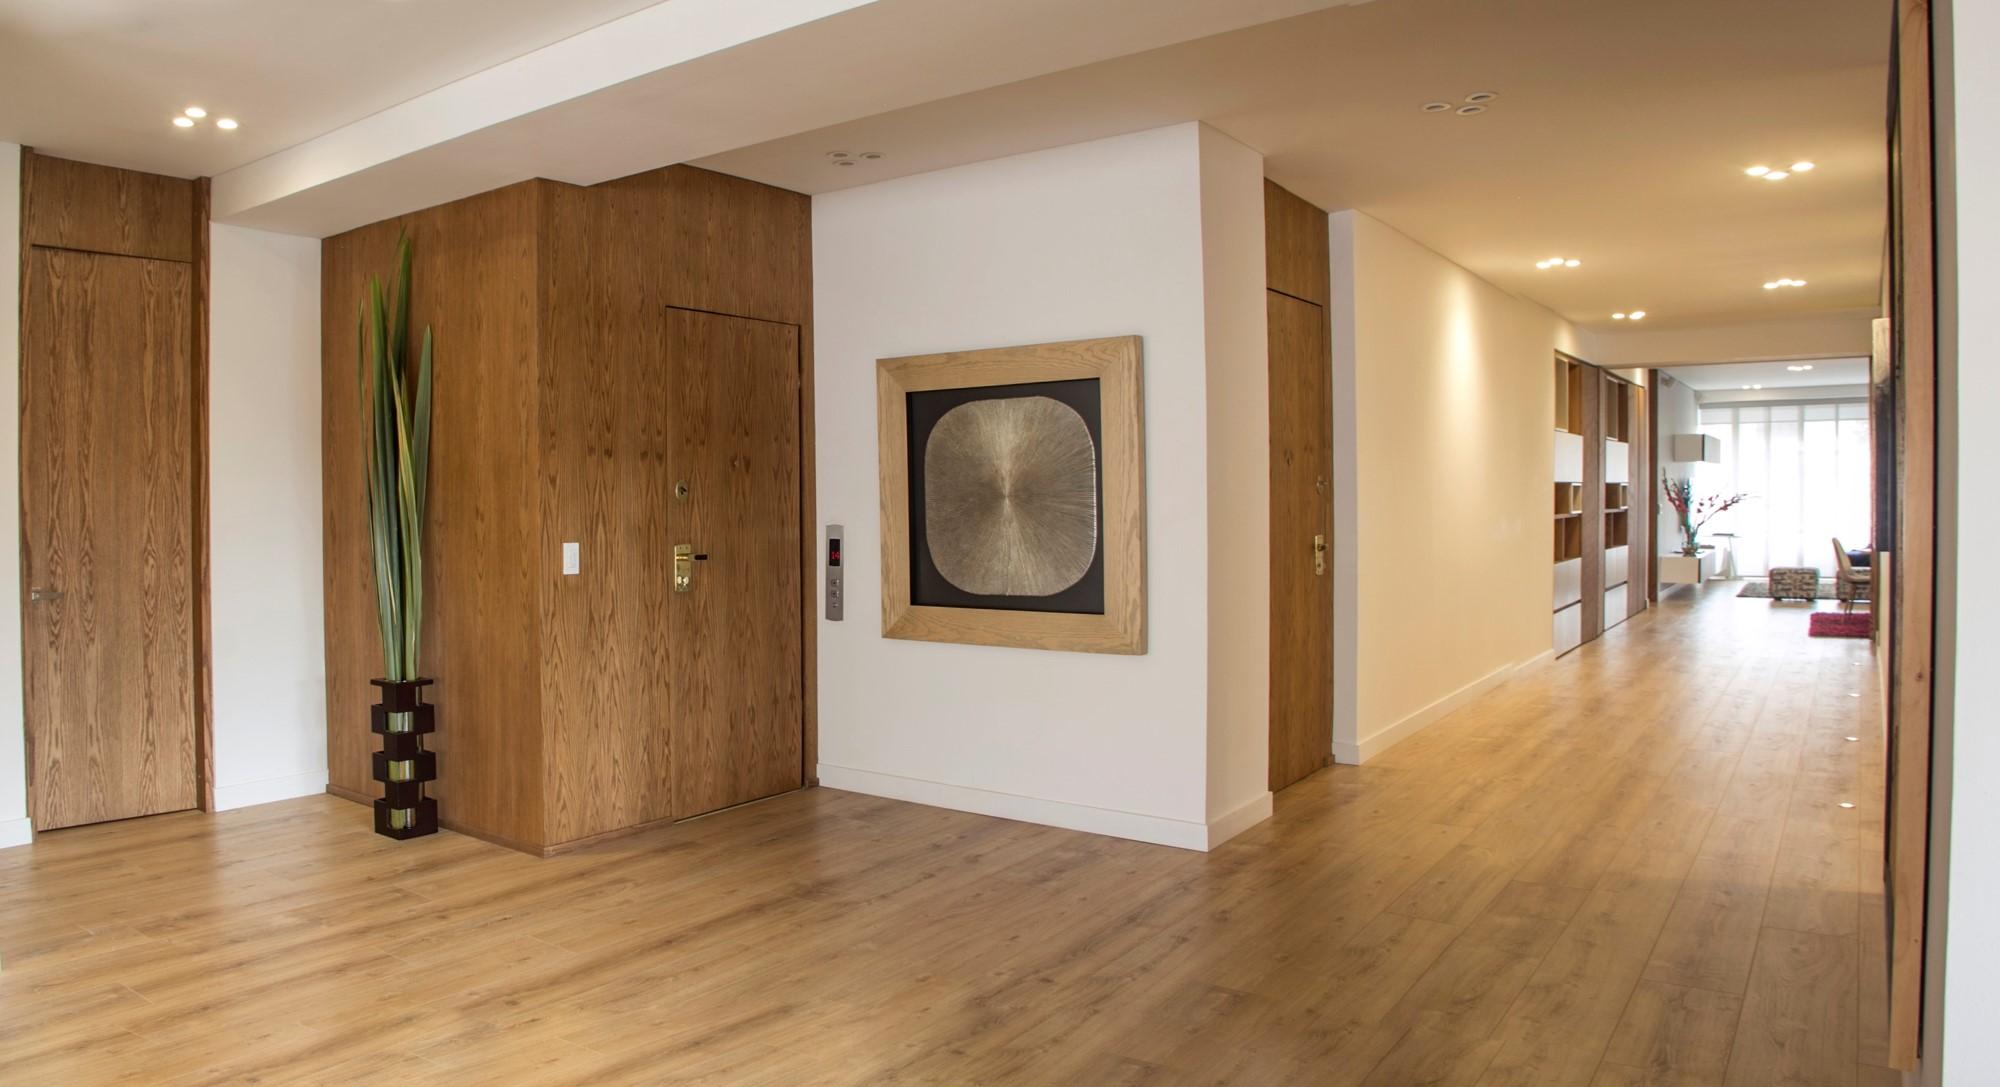 Diseño de espacios 1